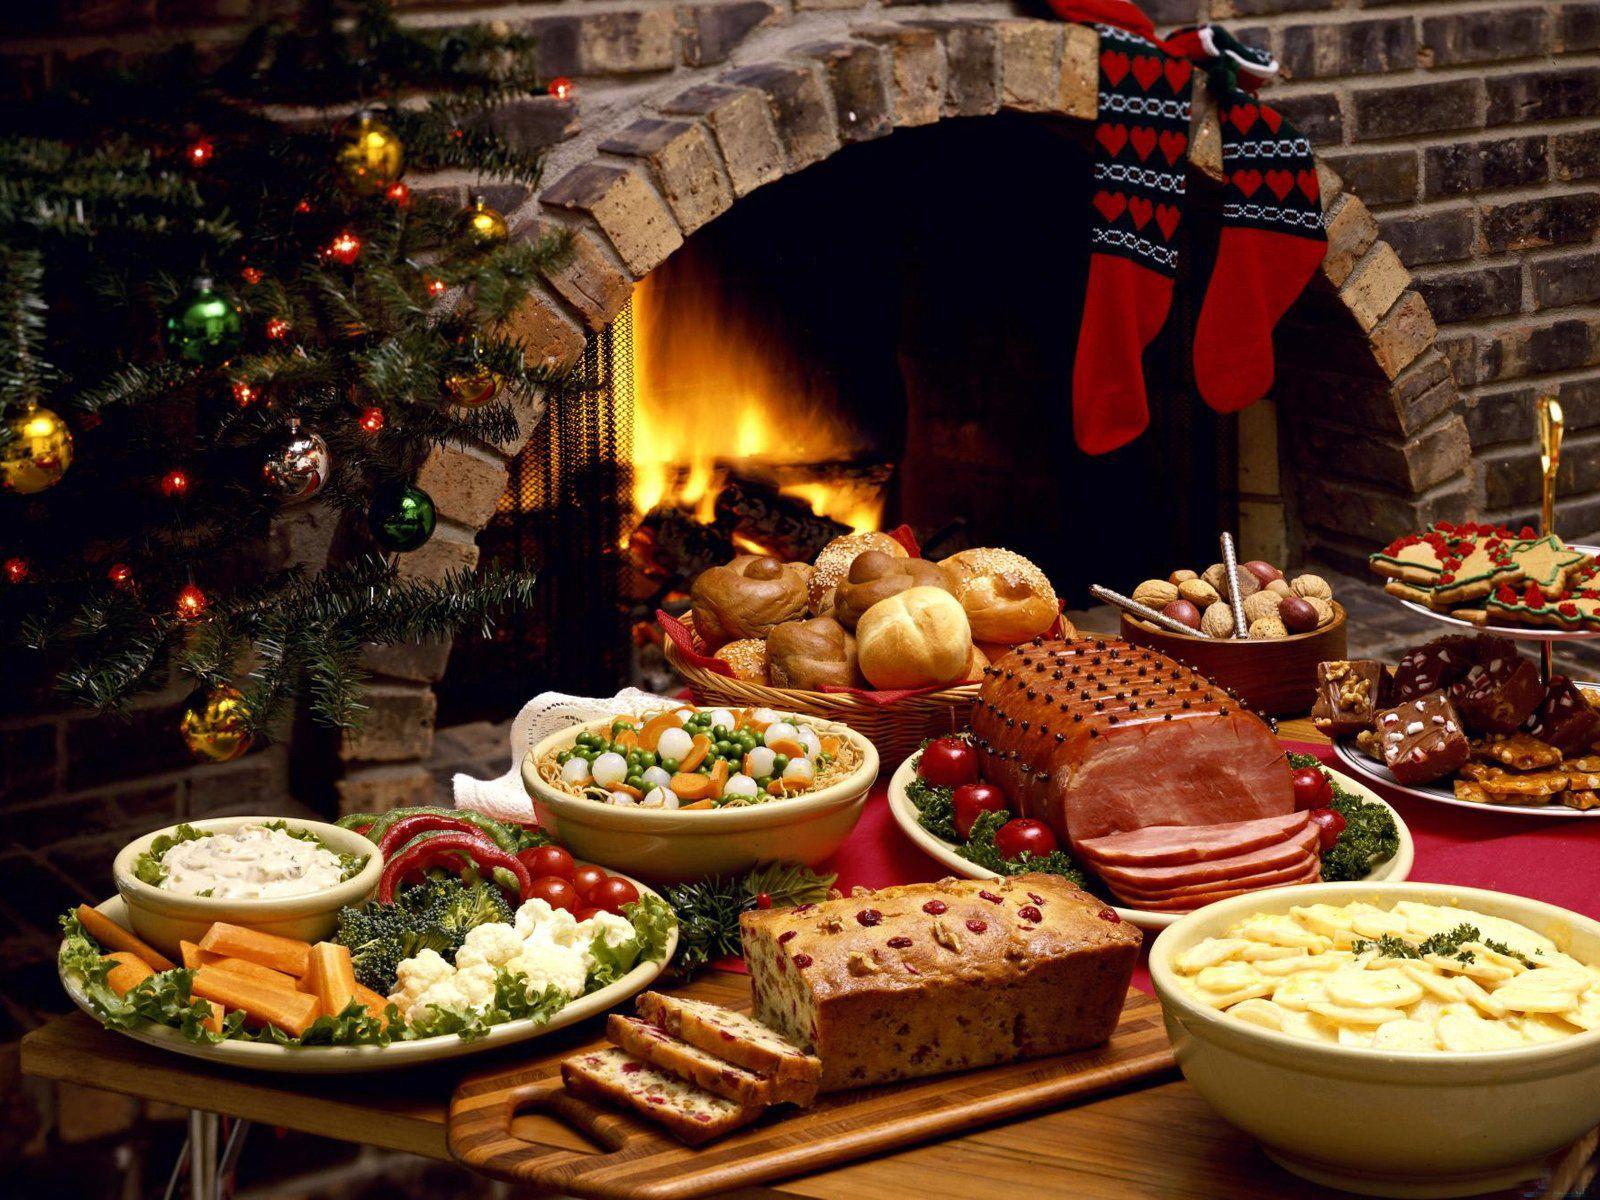 Breakfast Lunch Dinner Recipe Ideas For Christmas